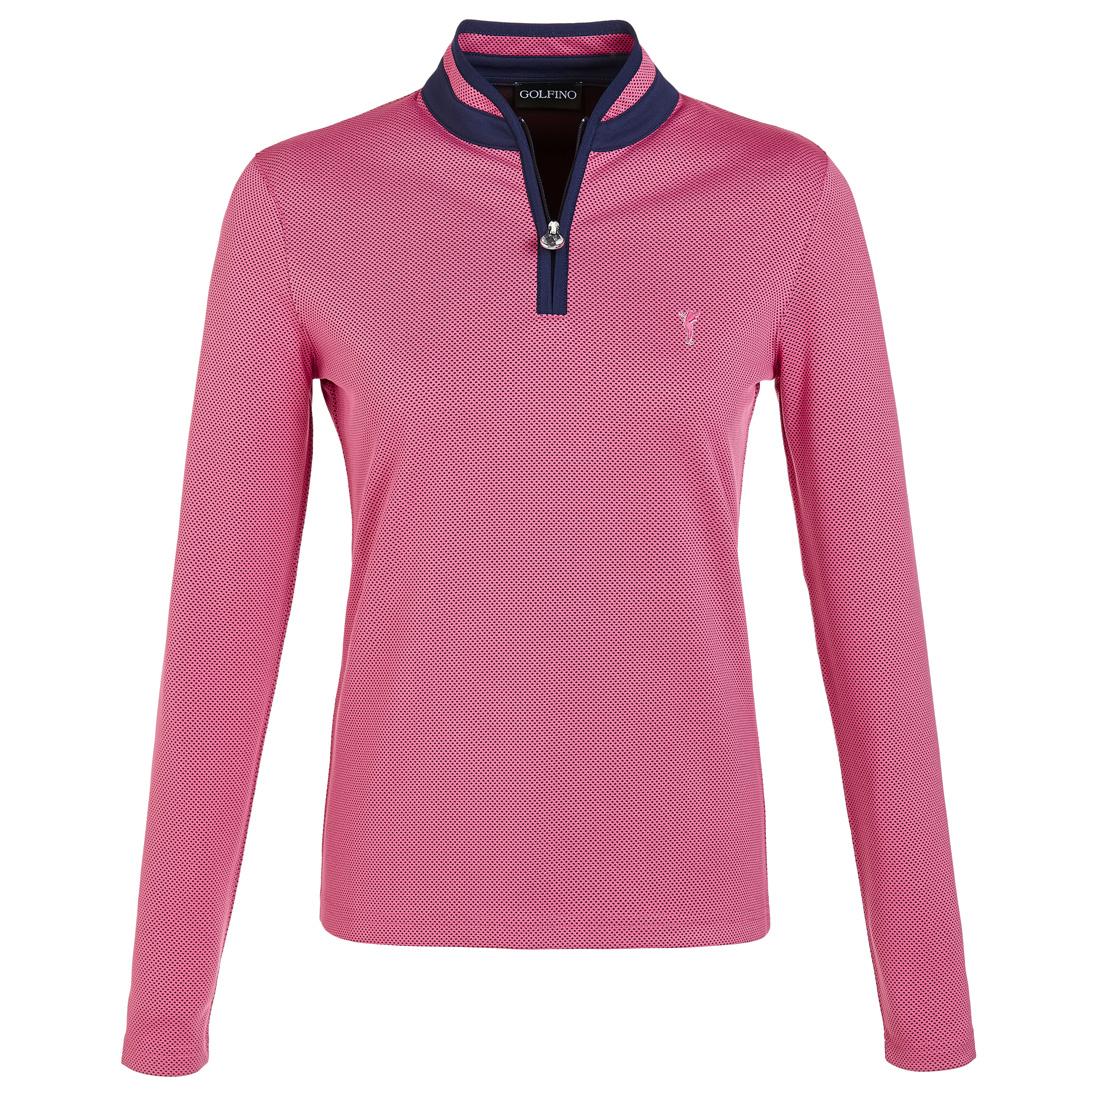 Jacquard Damen Golfunterzieher Quick Dry mit kurzem Kristall-Zip